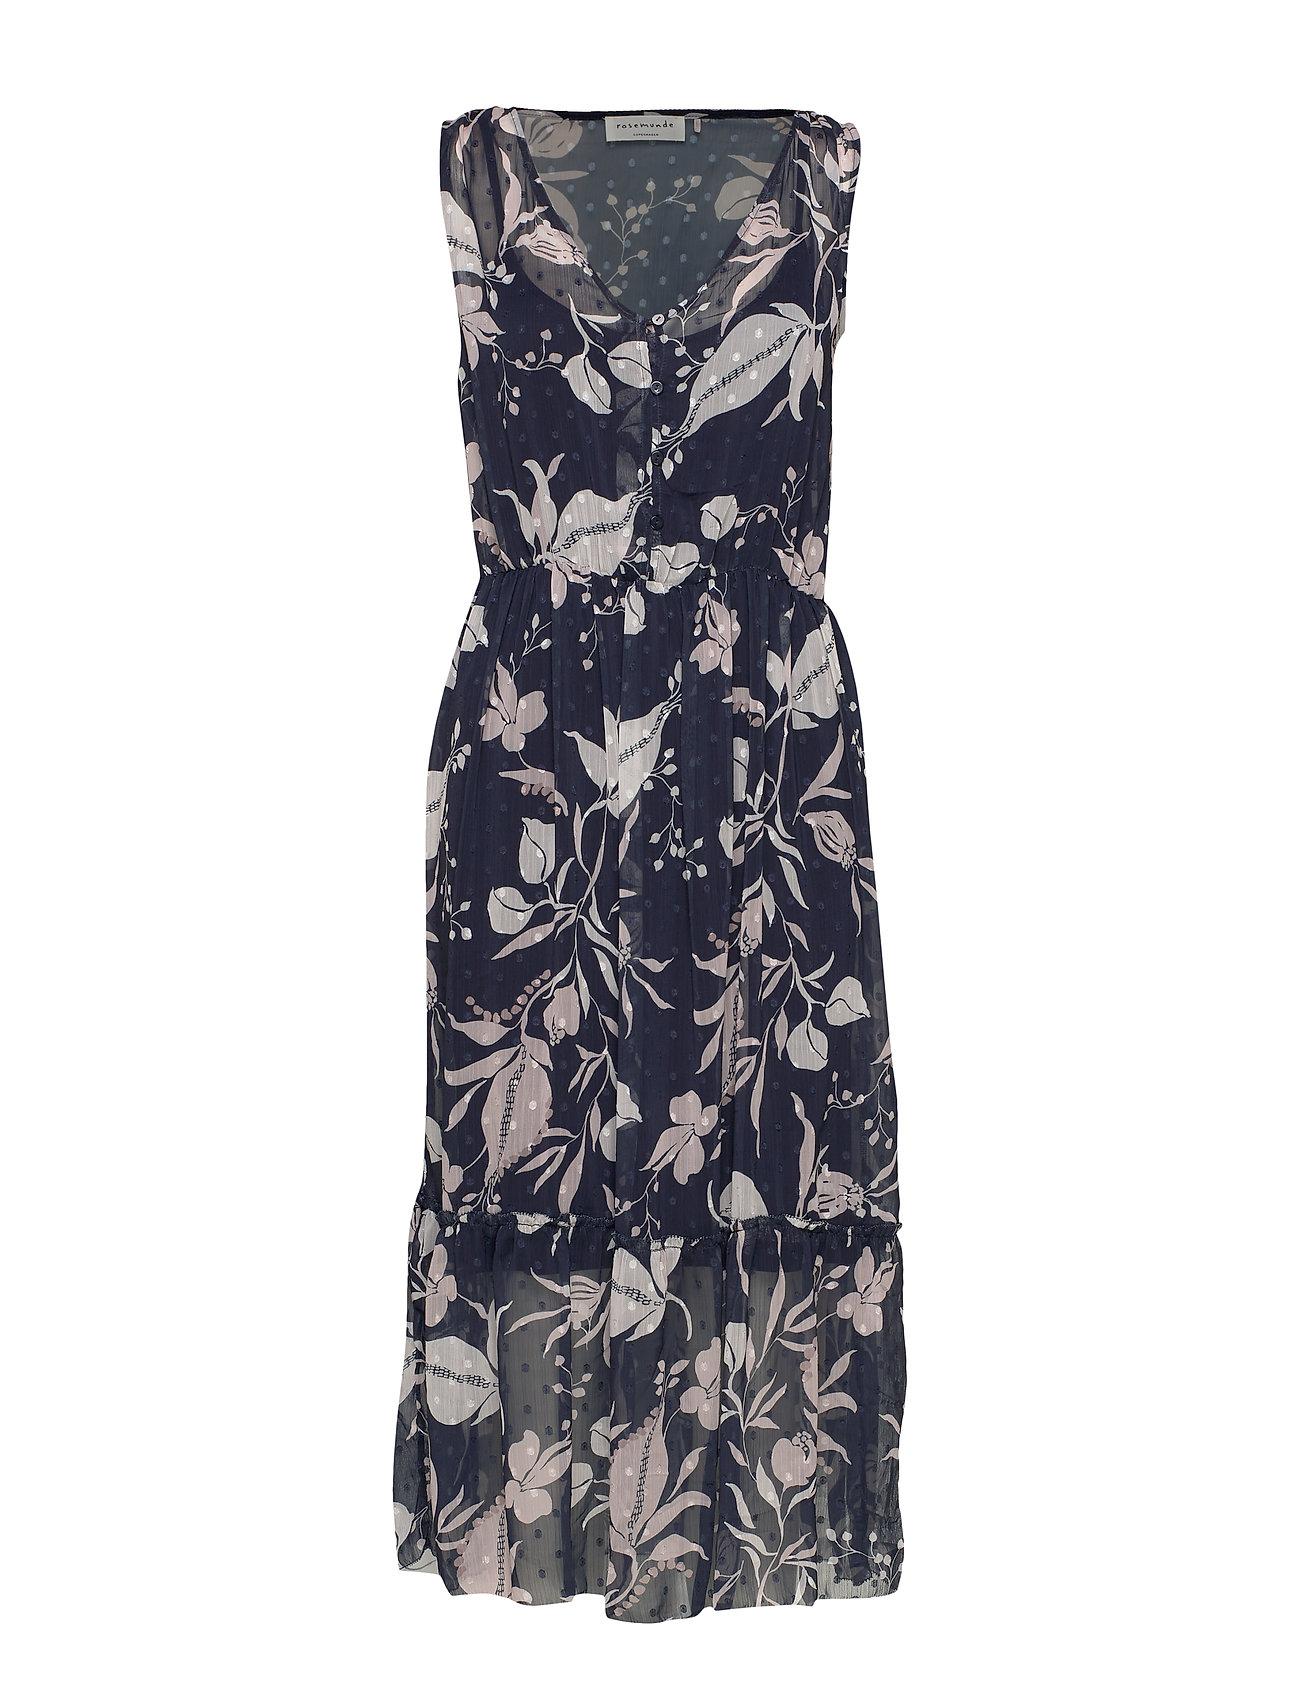 Rosemunde Dress - BLUE LILY POETRY PRINT